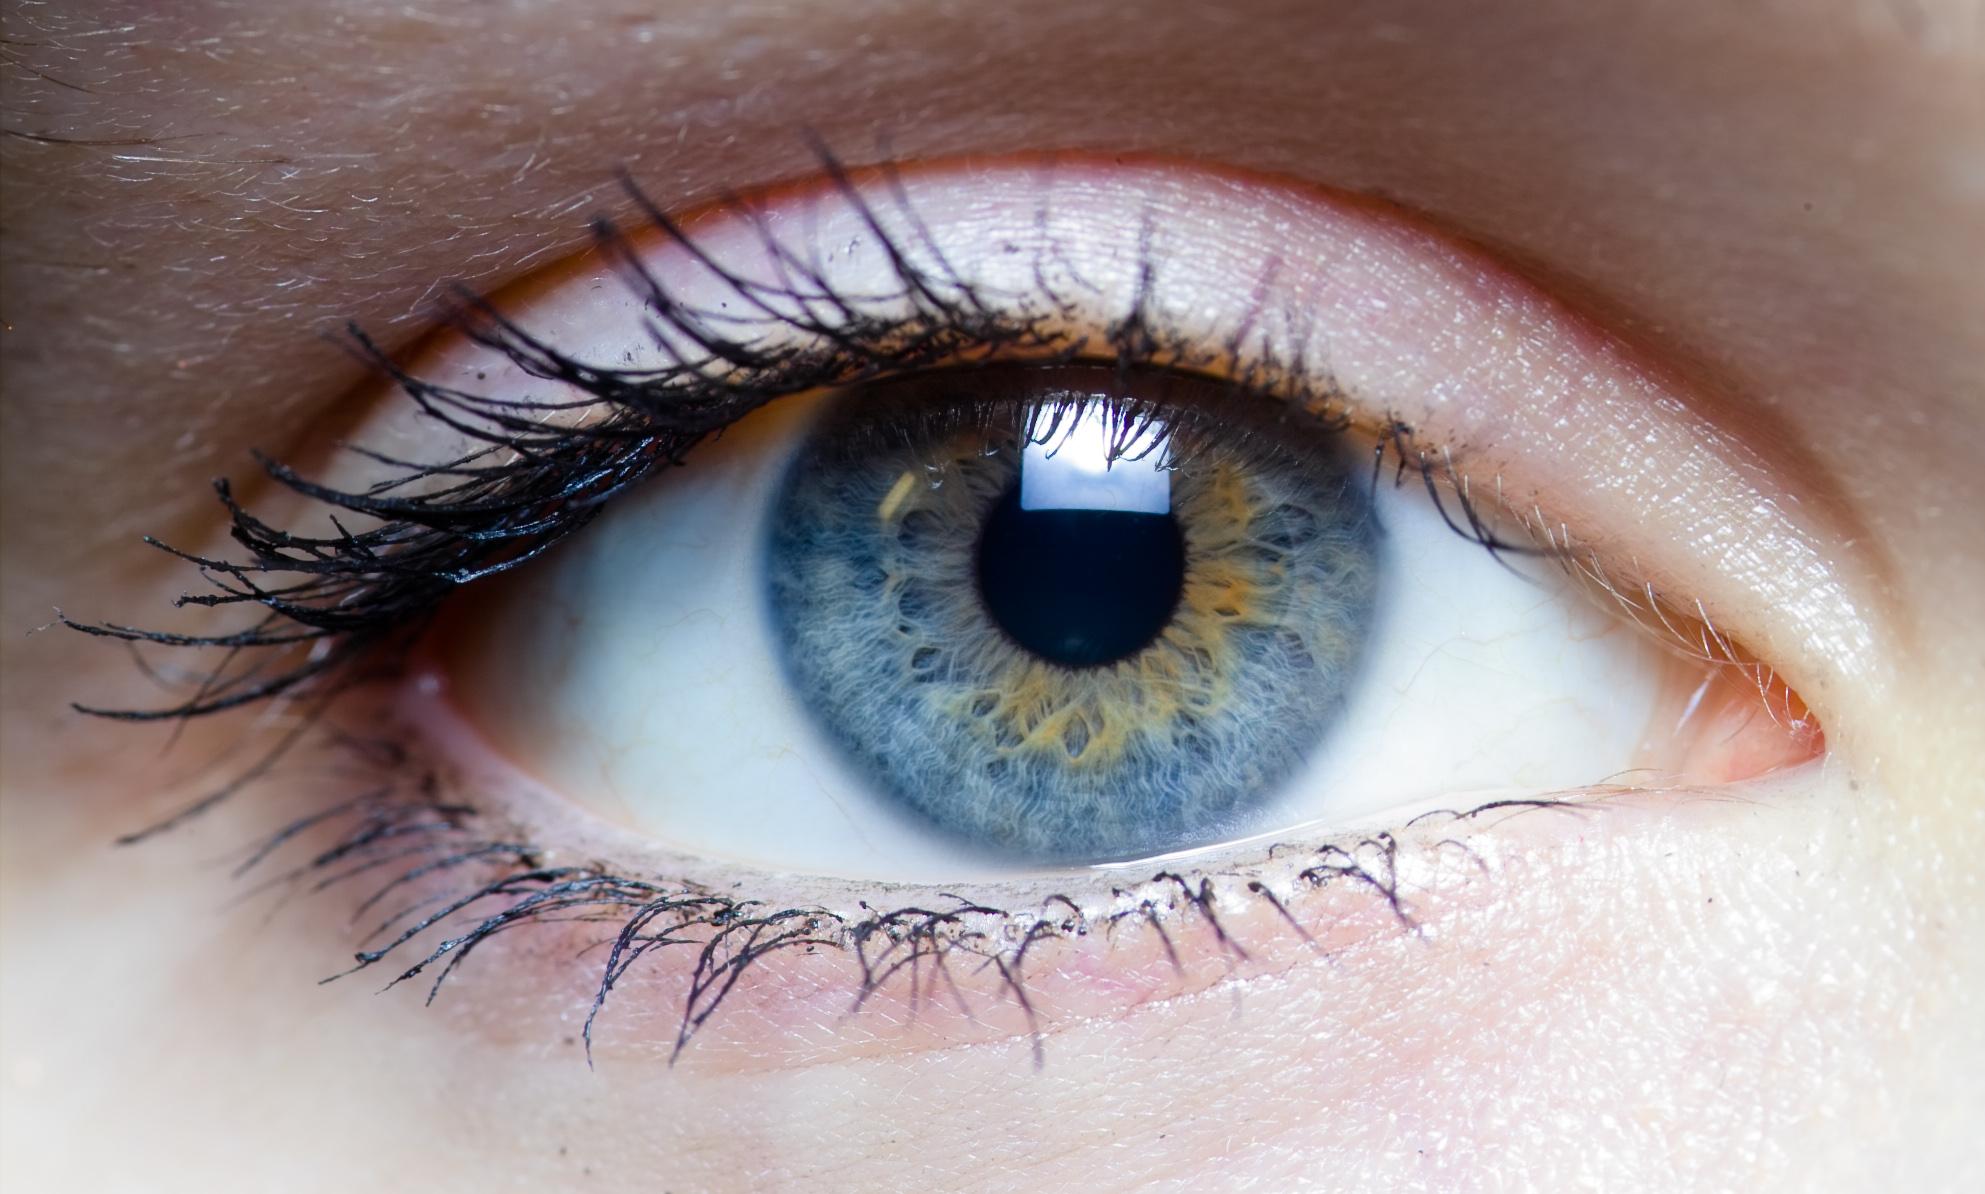 January declared glaucoma awareness month